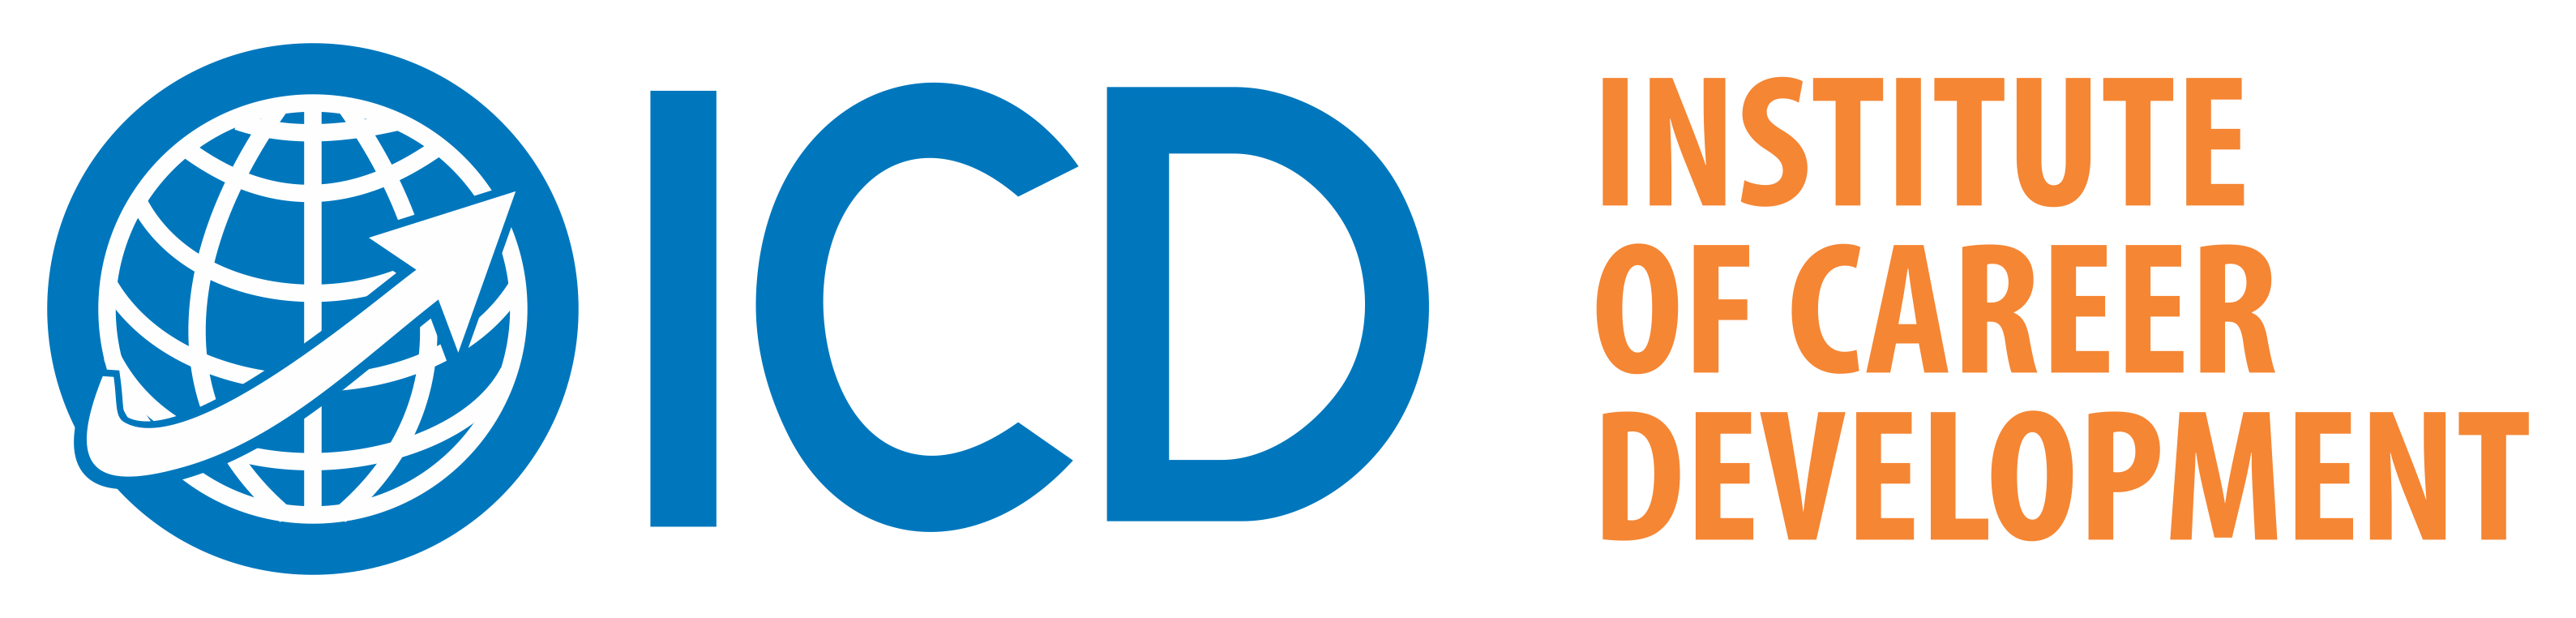 ICD Pakistan